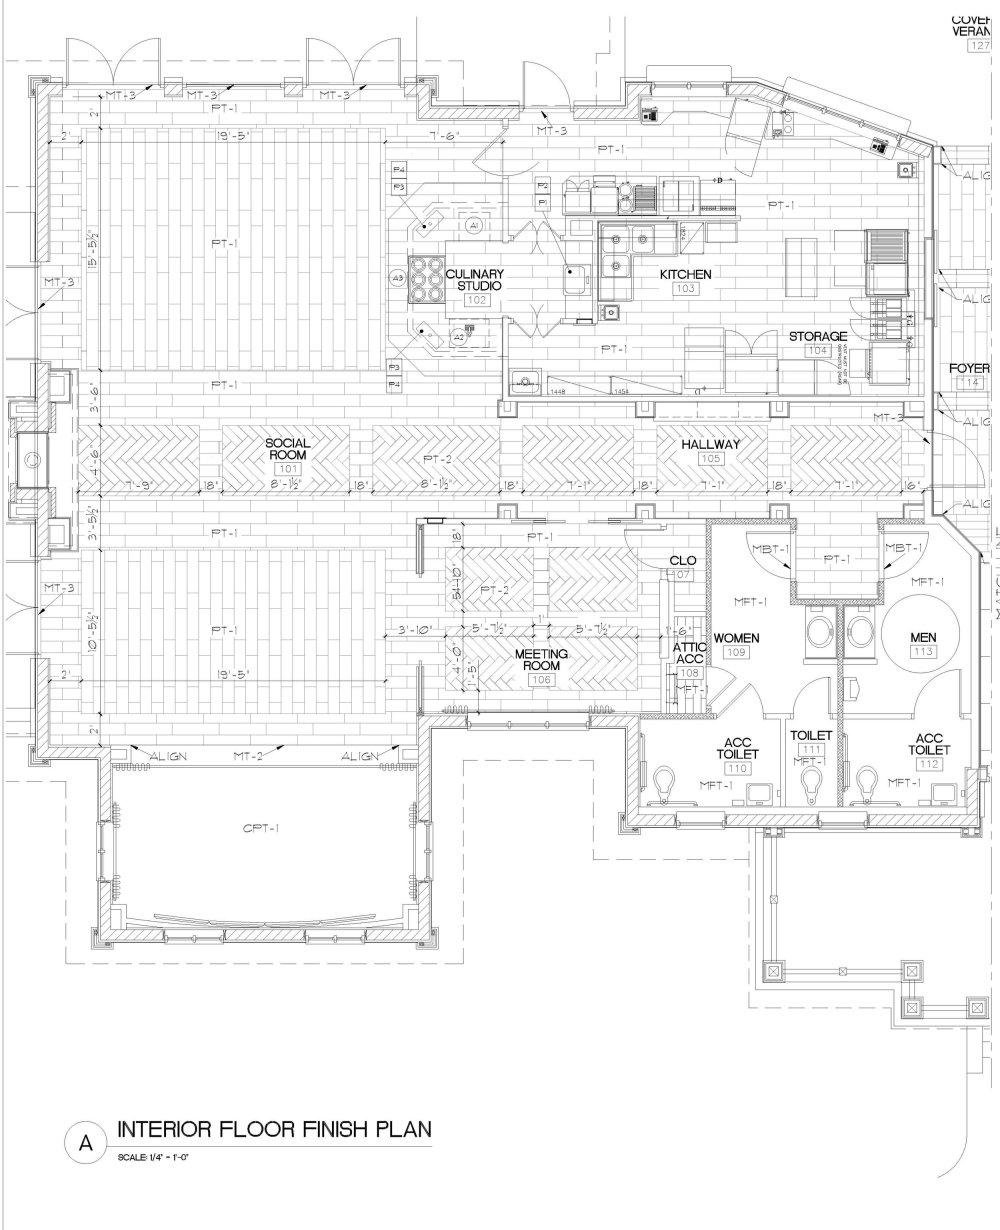 medium resolution of micamy design studio interior design beacon lake amenity center clubhouse new england style nautical hallway barrel ceiling pendants herringbone